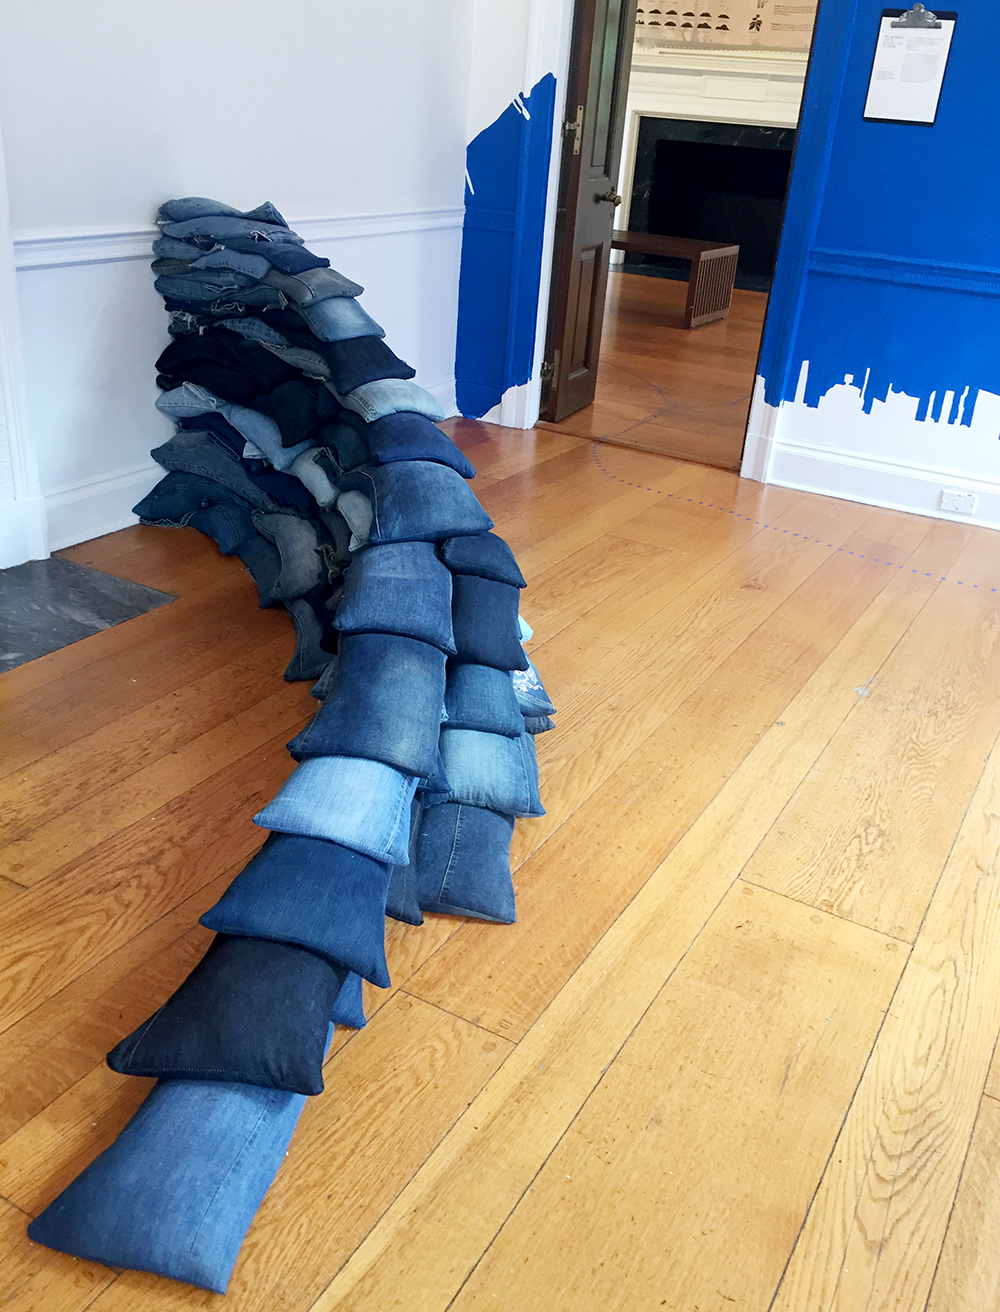 Denim sandbags by Jean Shin at Wave Hill, Bronx, N.Y.| Photo credit: Rose Spaziani